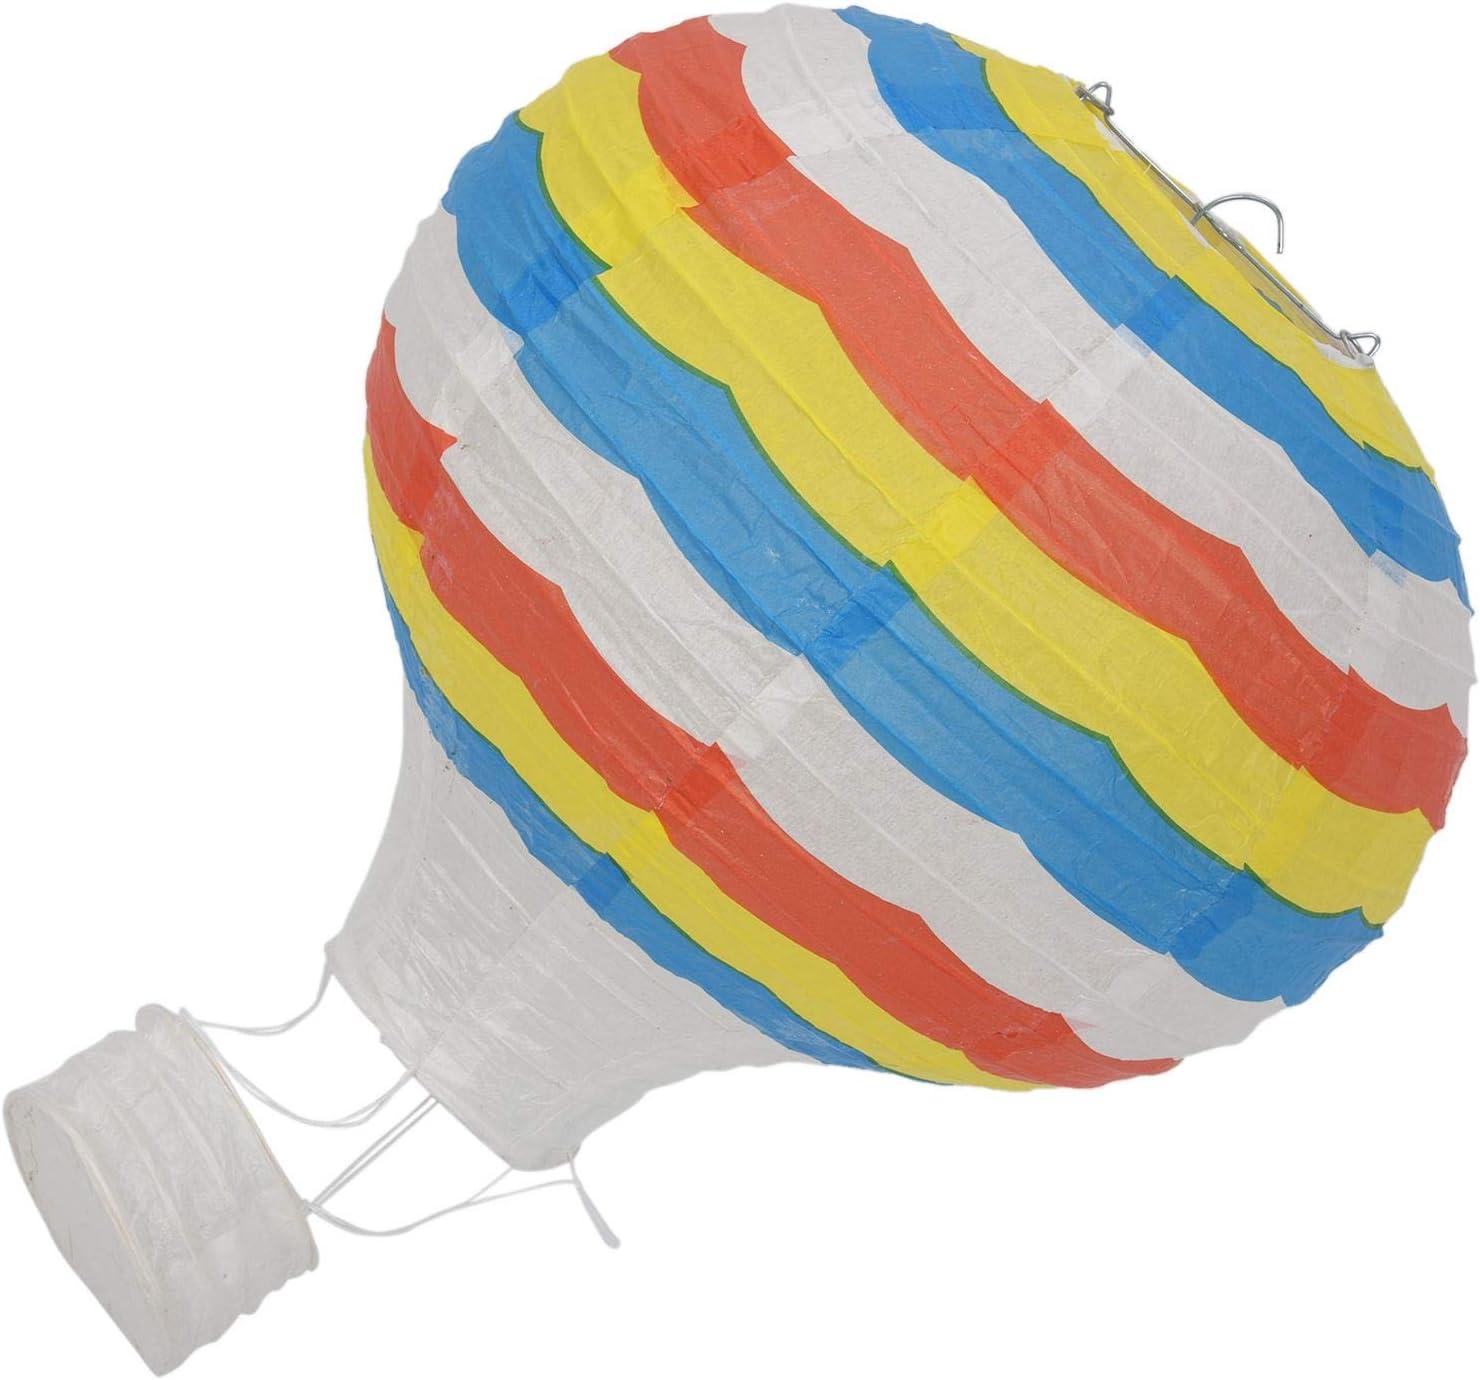 Vaorwne 12inch Hot Air Balloon Paper Lantern Lampshade Ceiling Light Wedding Party Decor Blue Rainbow